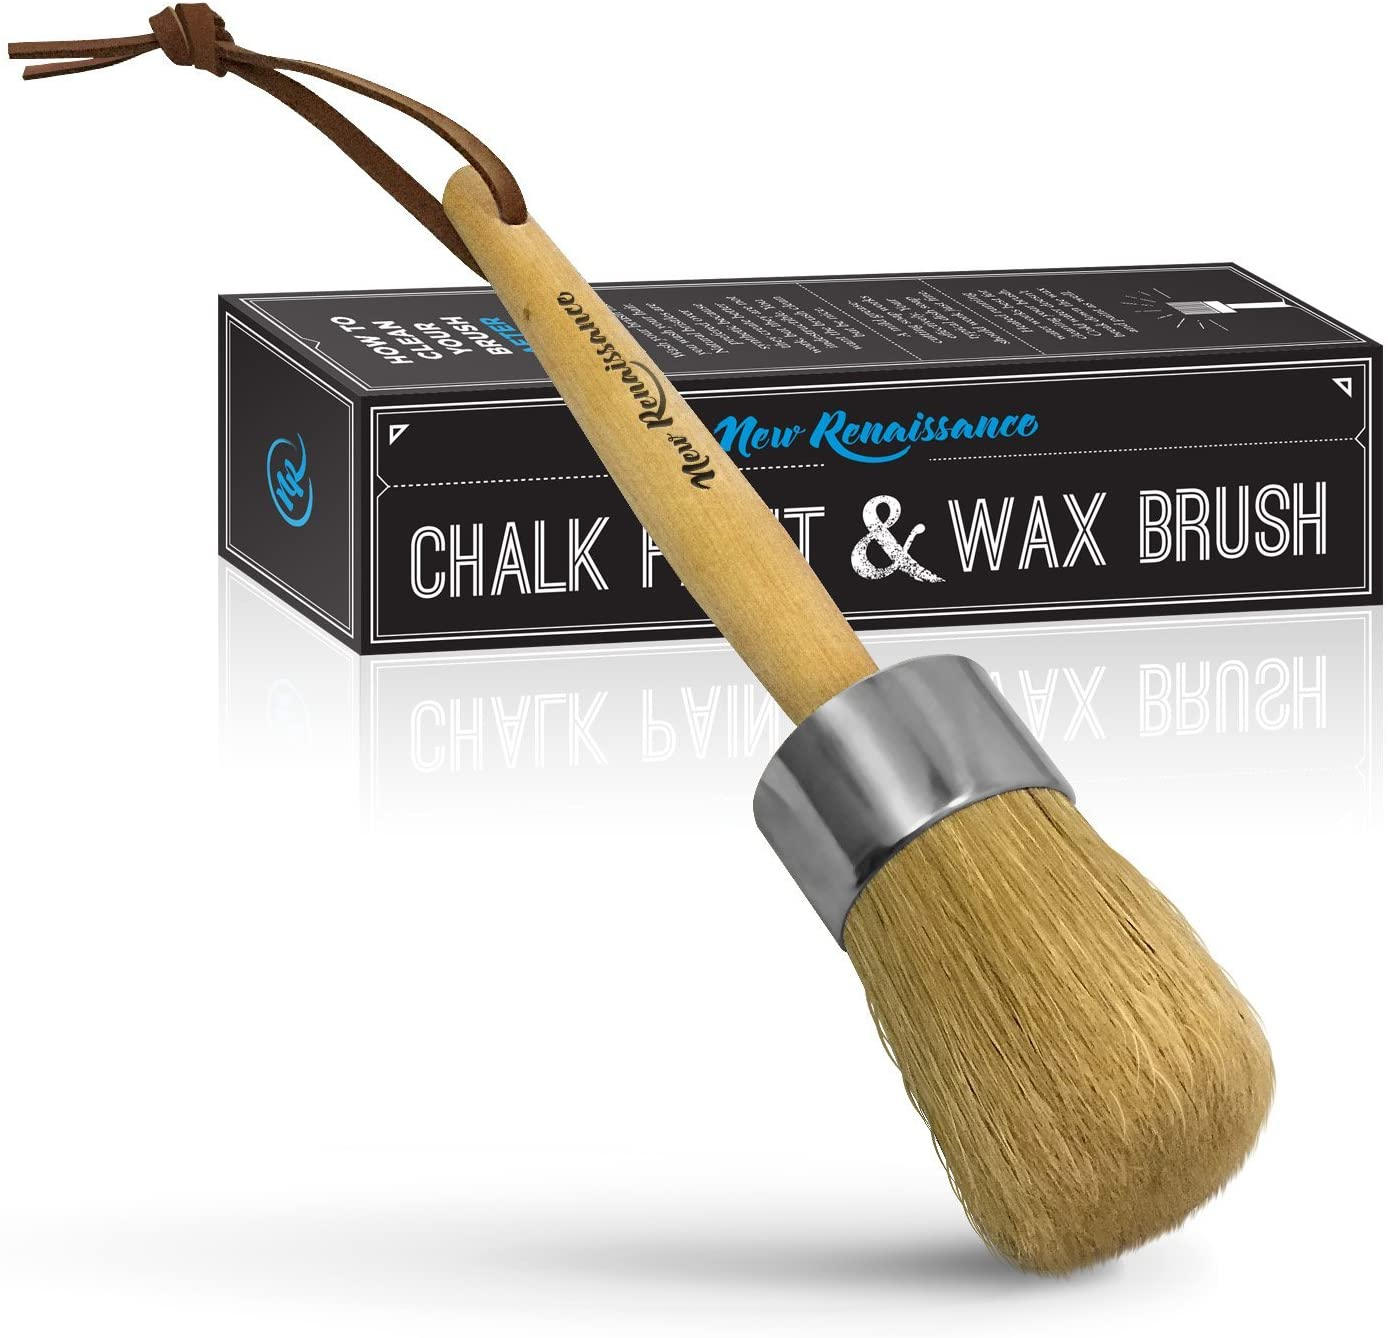 New-Renaissance-Brush